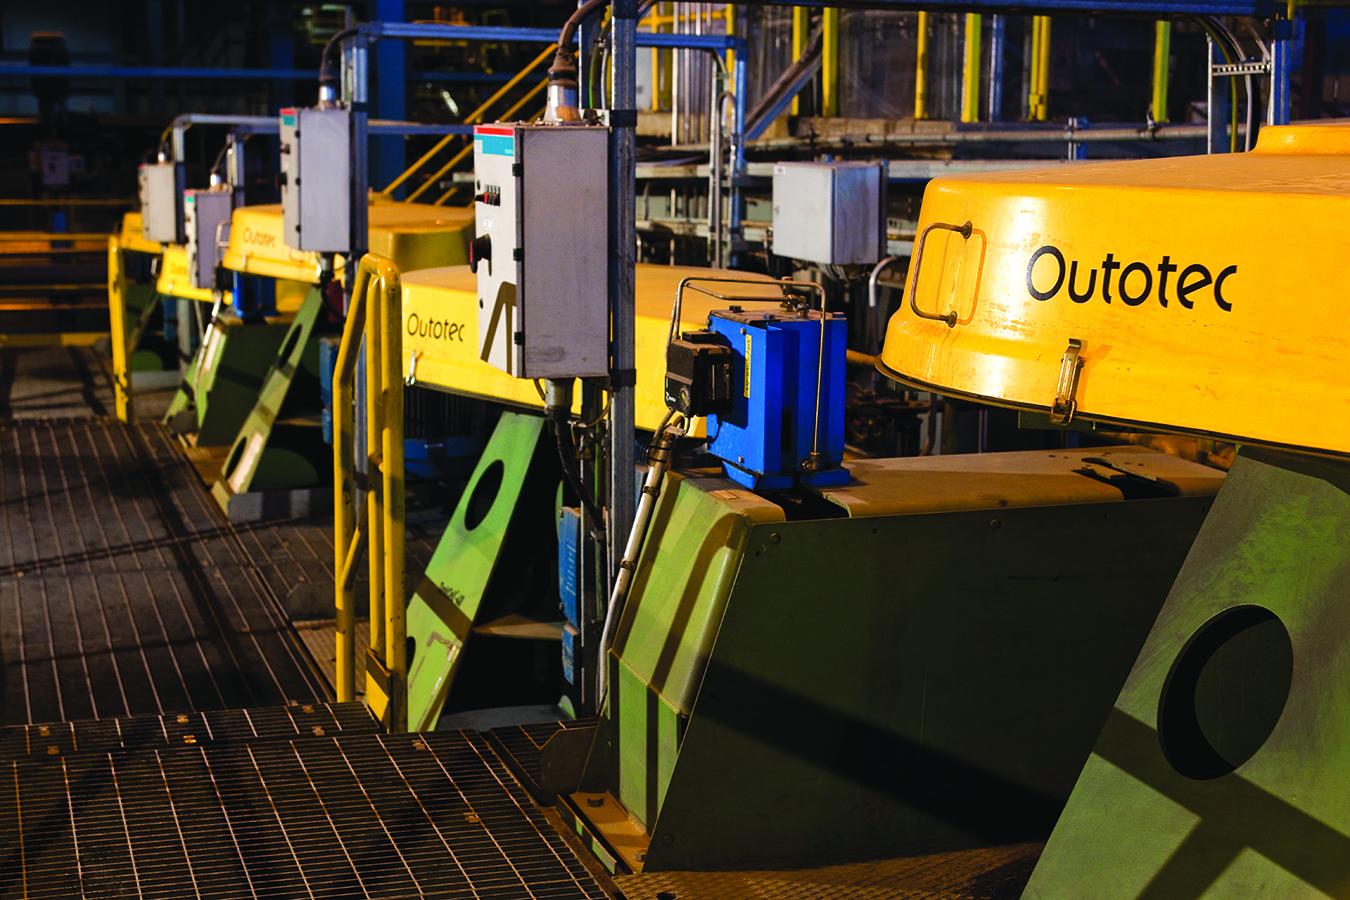 sb OTE concentrator plant flotation 0163